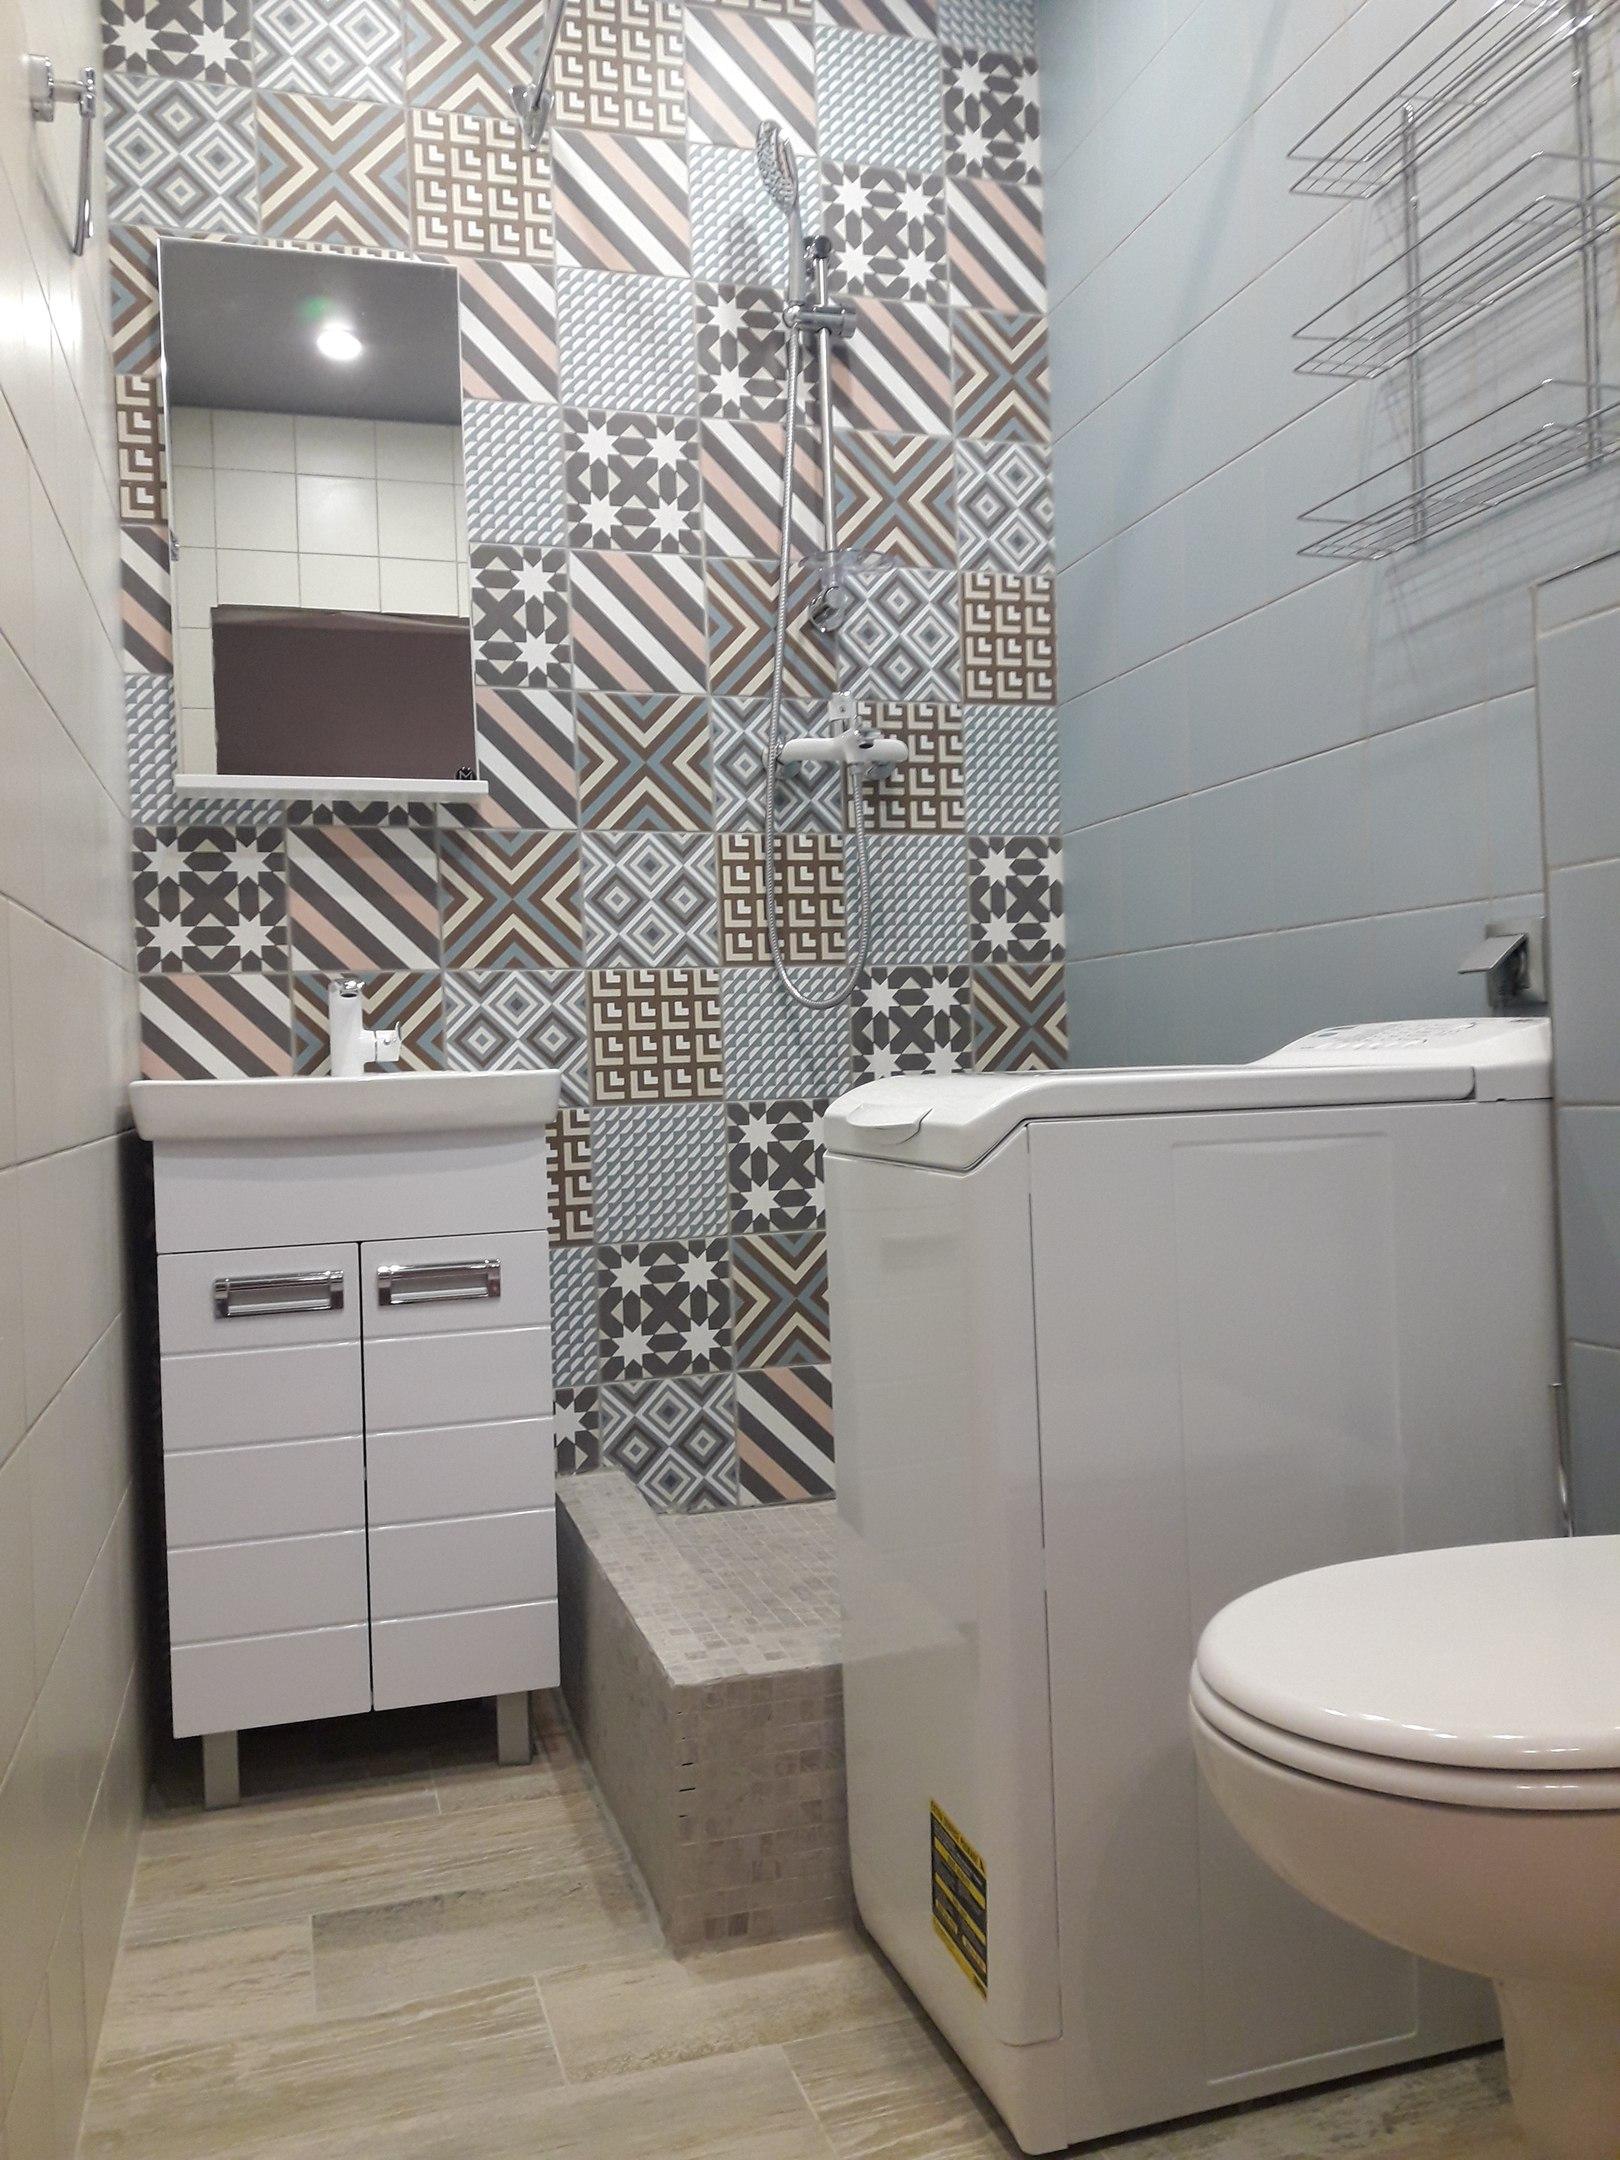 Дизайн-проект для ванных комнат фото f_4525b9e18794ffb7.jpg